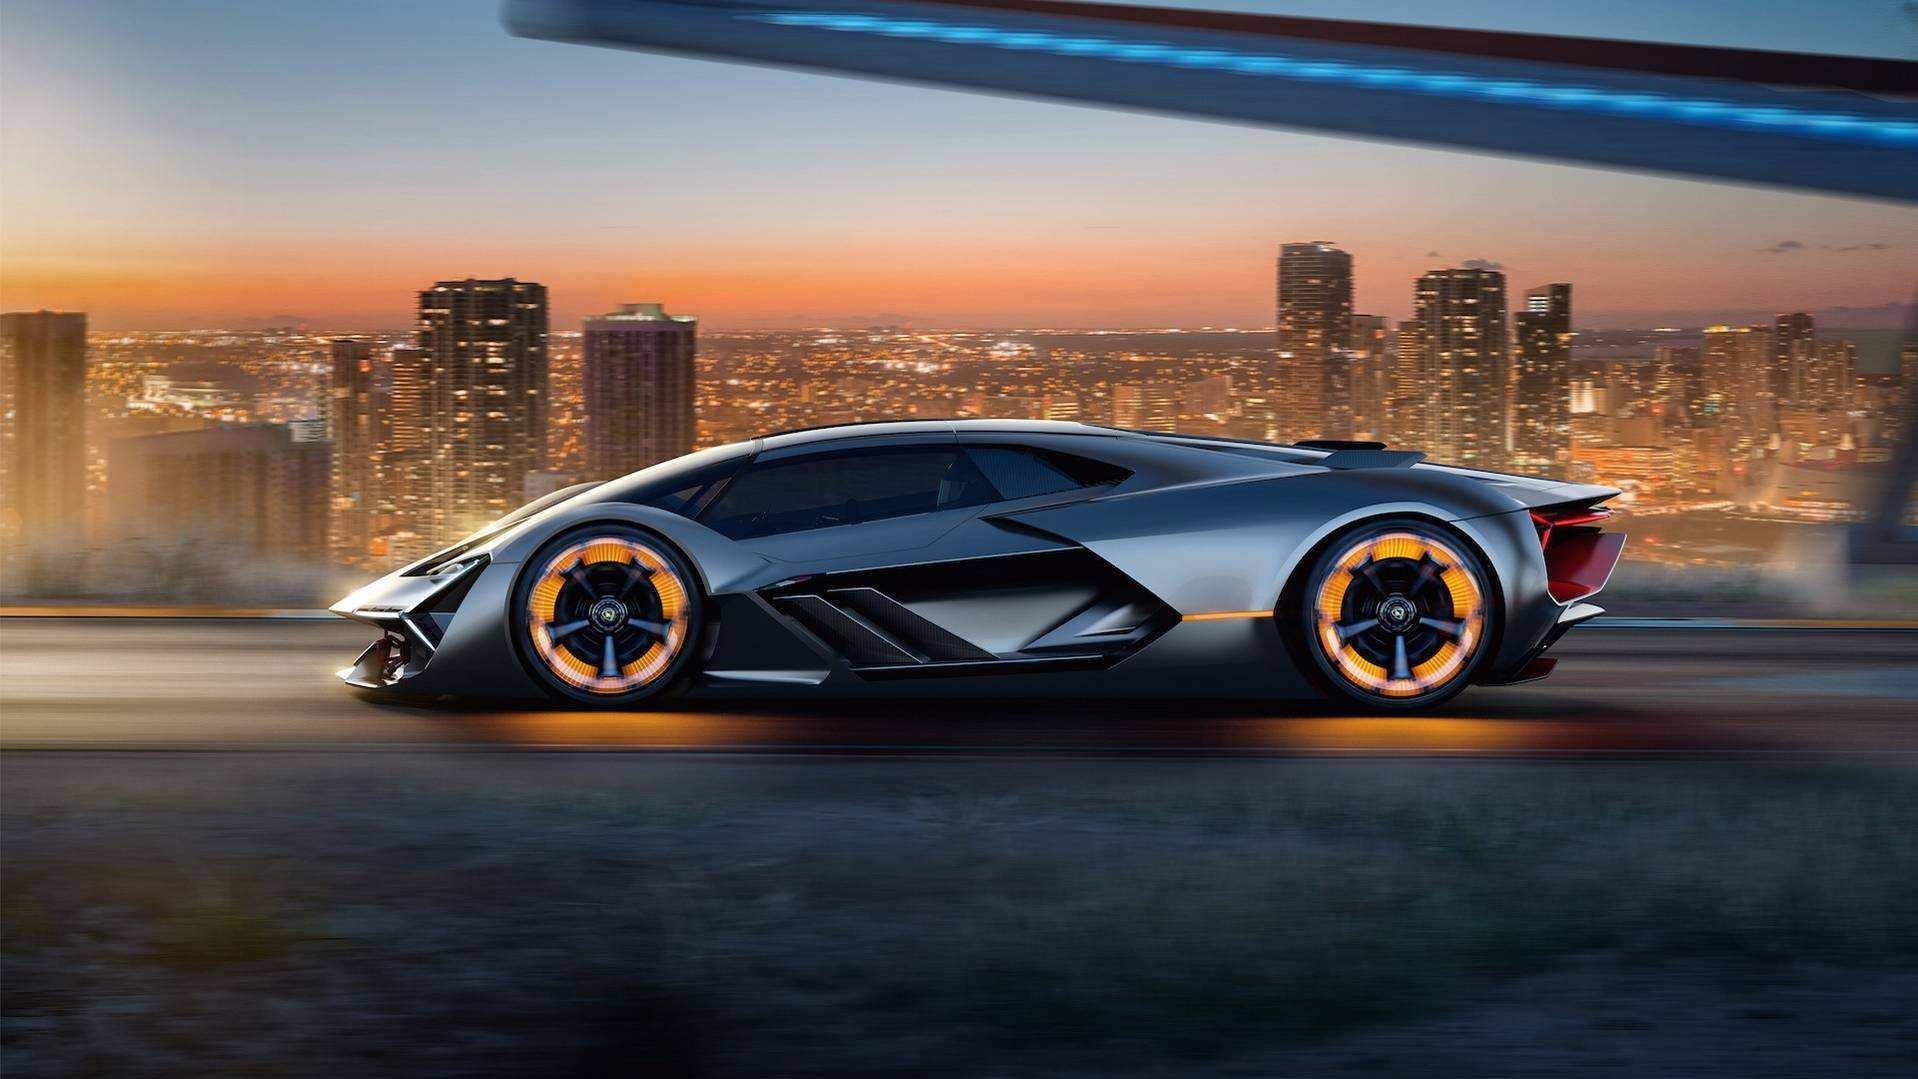 81 Great Lamborghini 2020 Prototype Pricing by Lamborghini 2020 Prototype